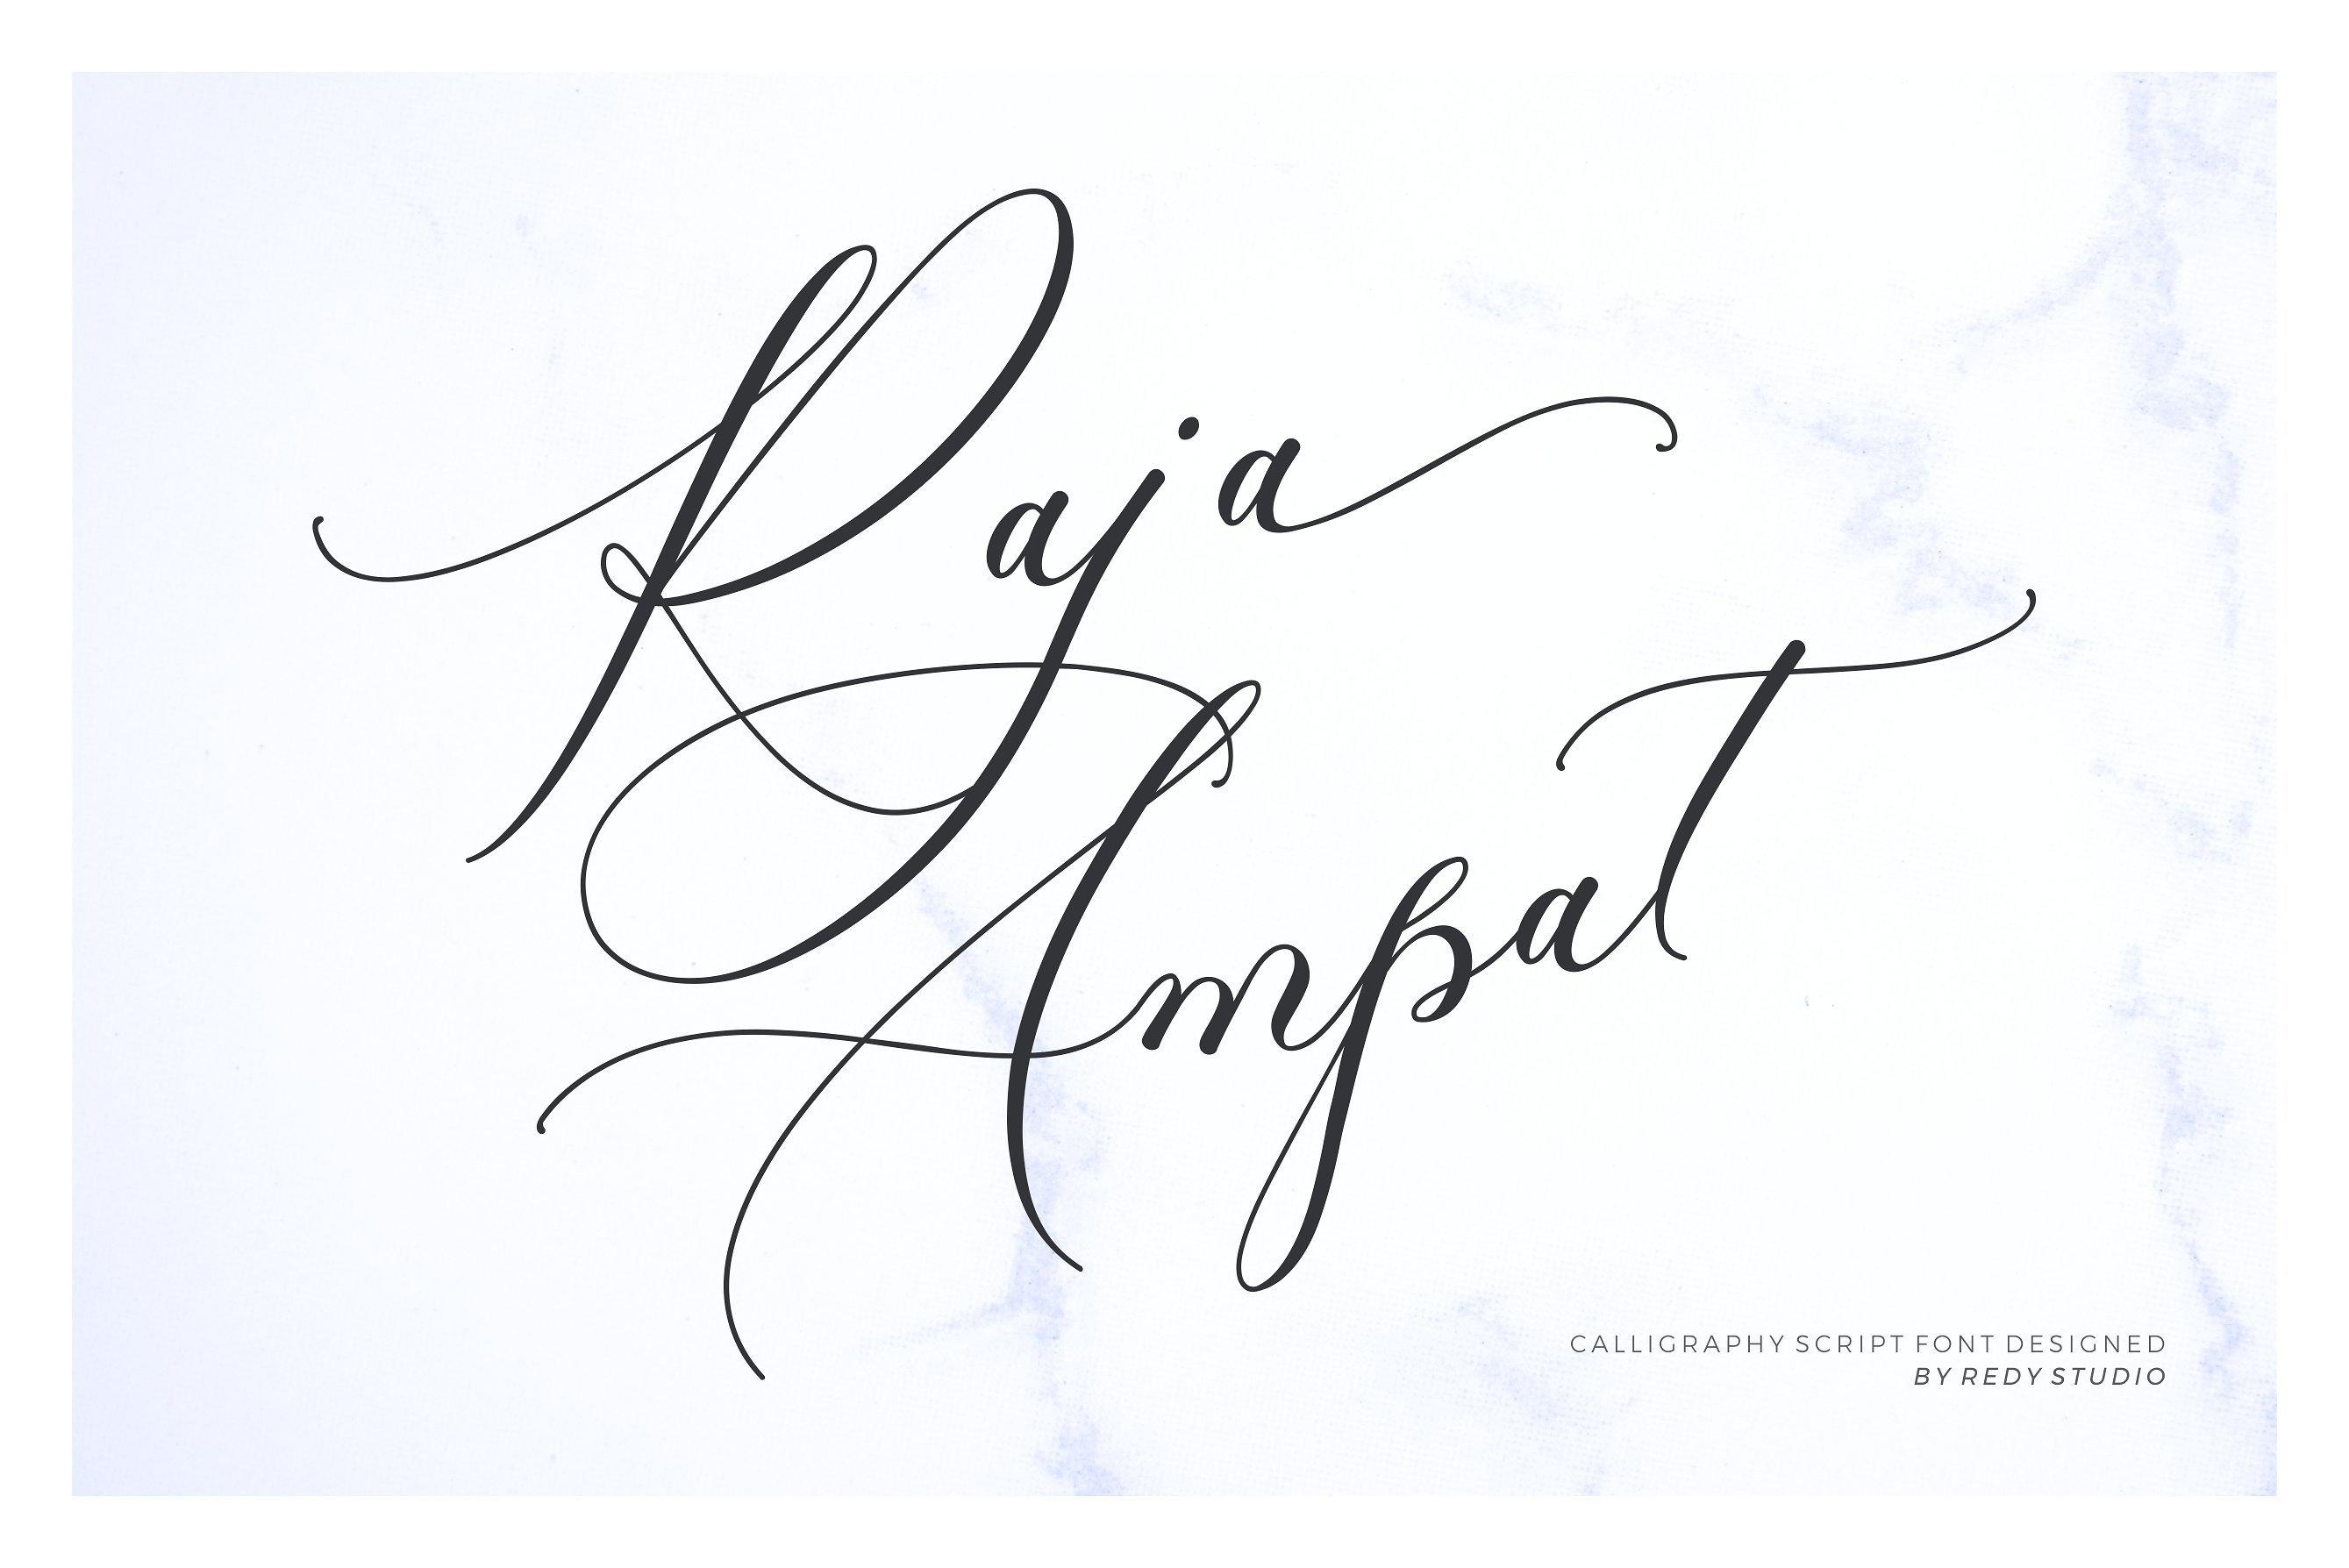 https://fontclarity.com/wp-content/uploads/2019/09/raja-ampat-calligraphy-font-download-0.jpg Free Download